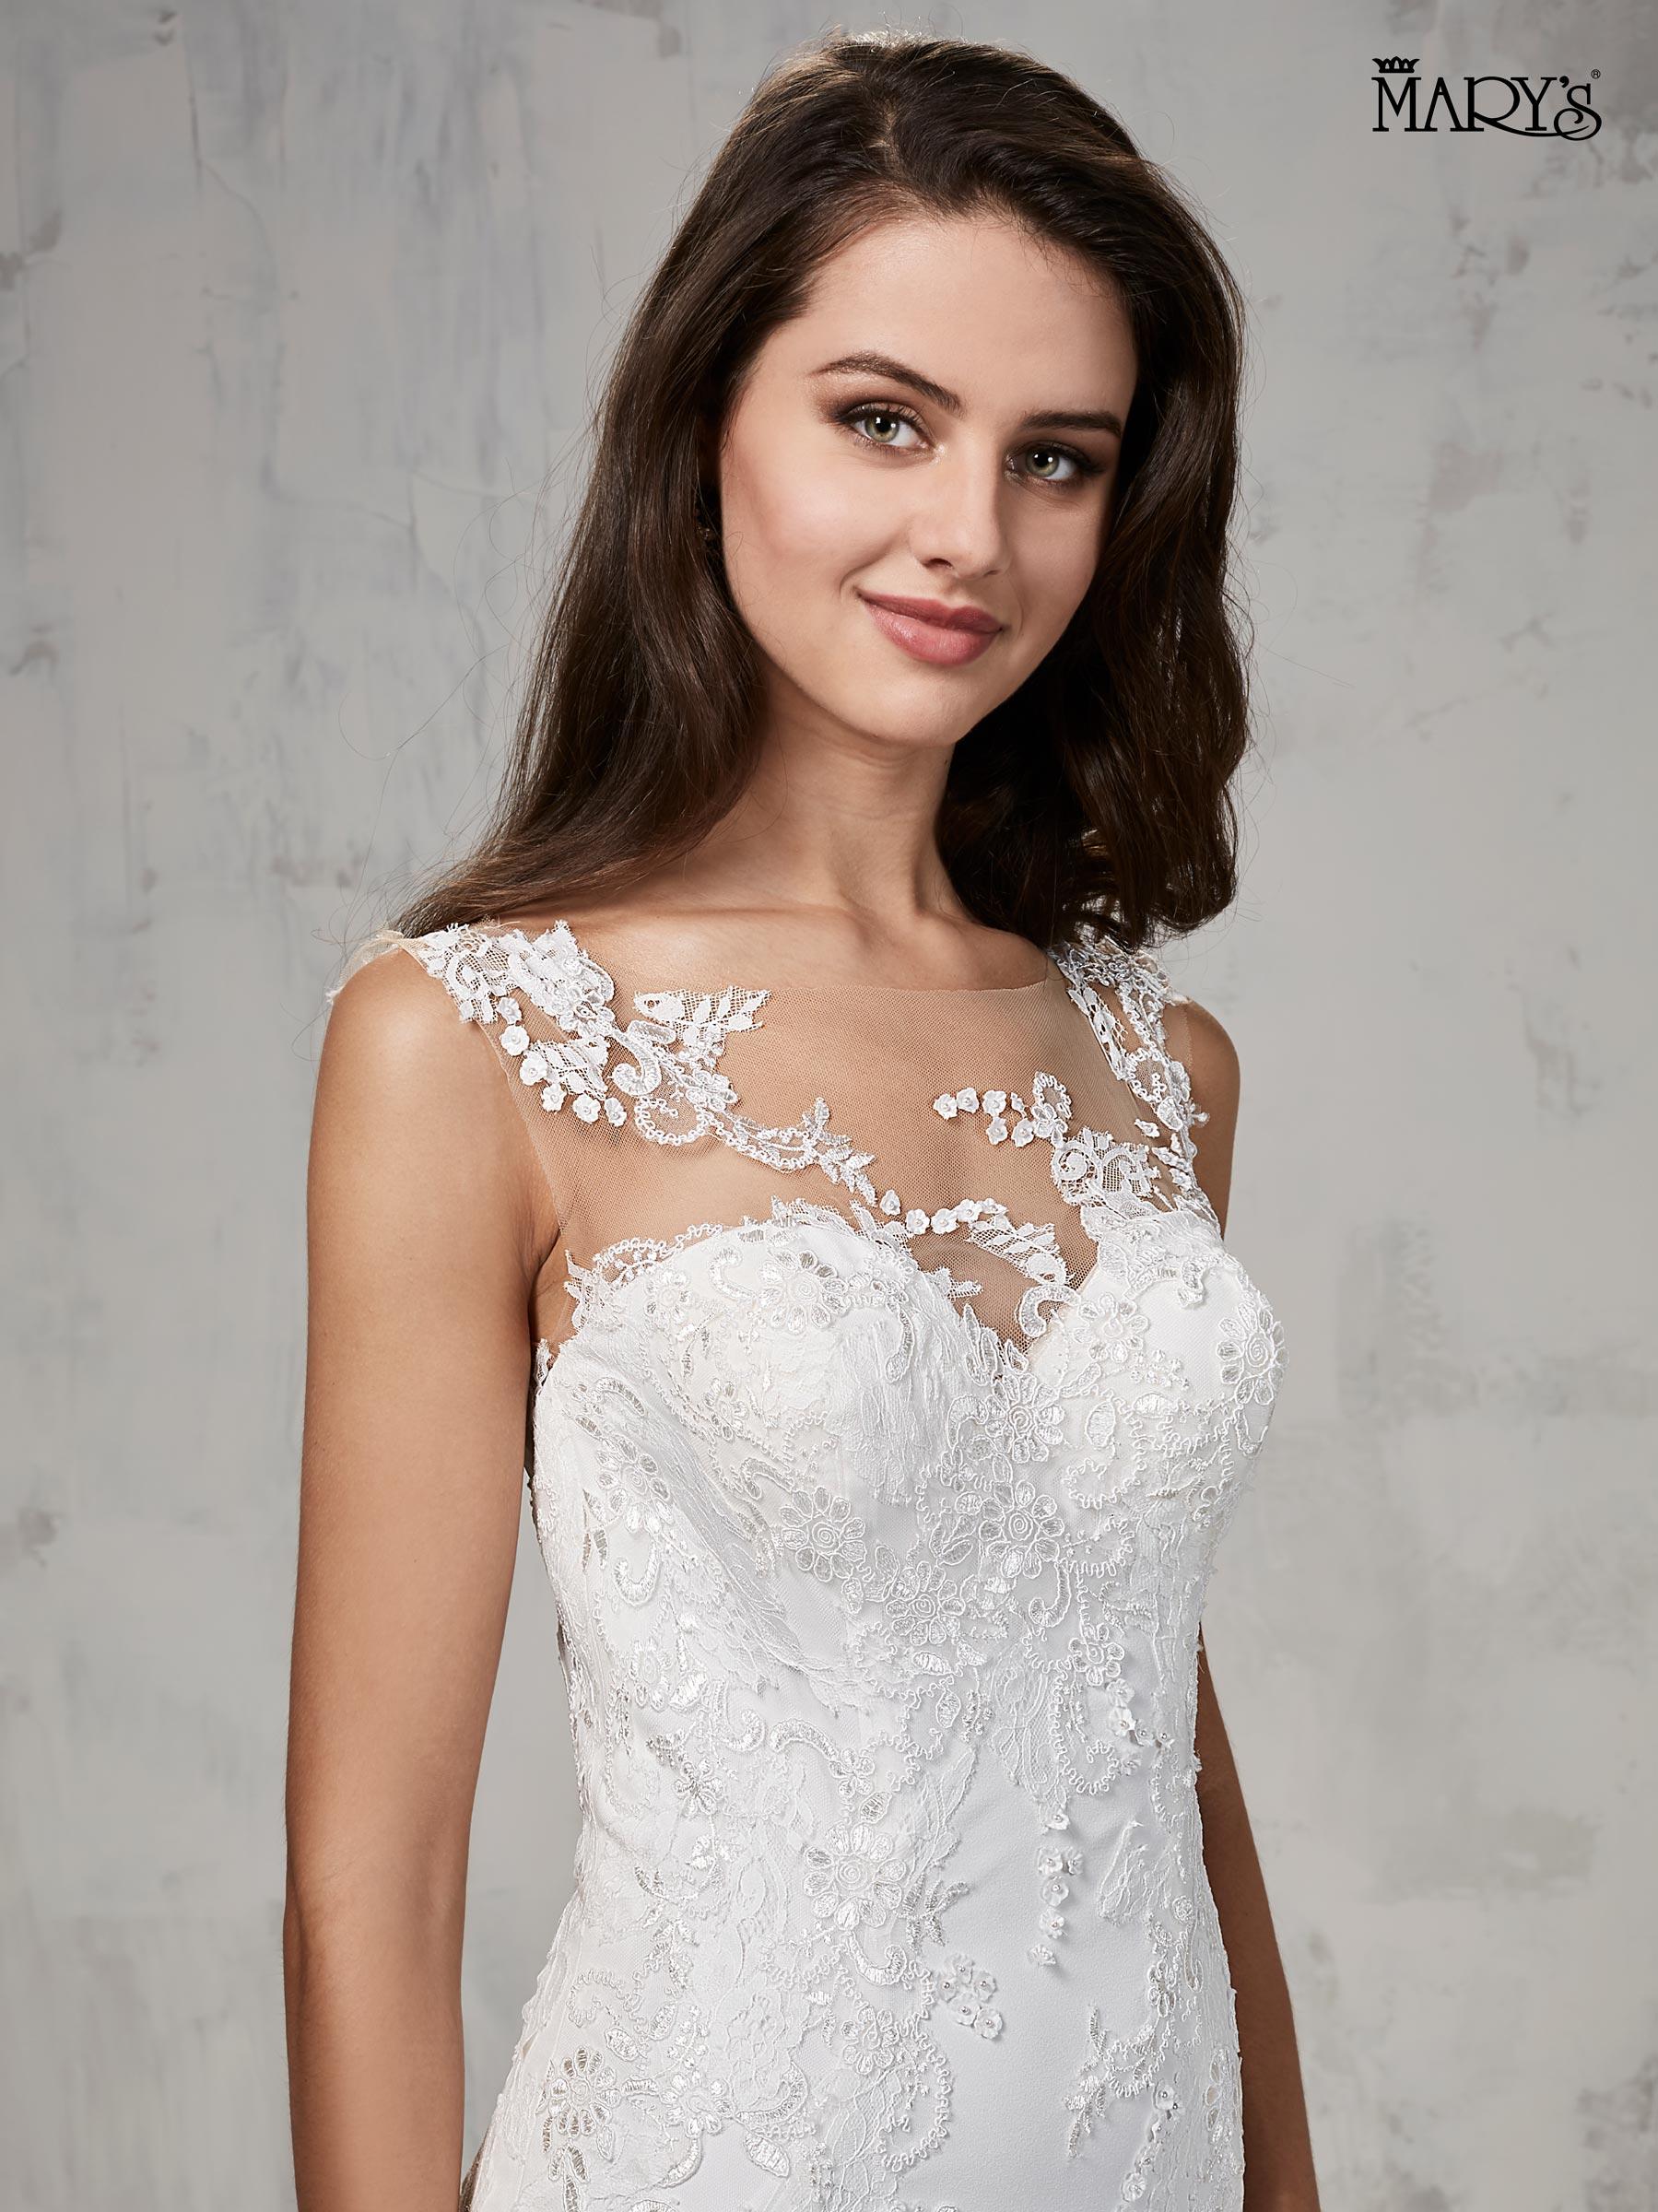 Bridal Wedding Dresses | Mary's | Style - MB3009